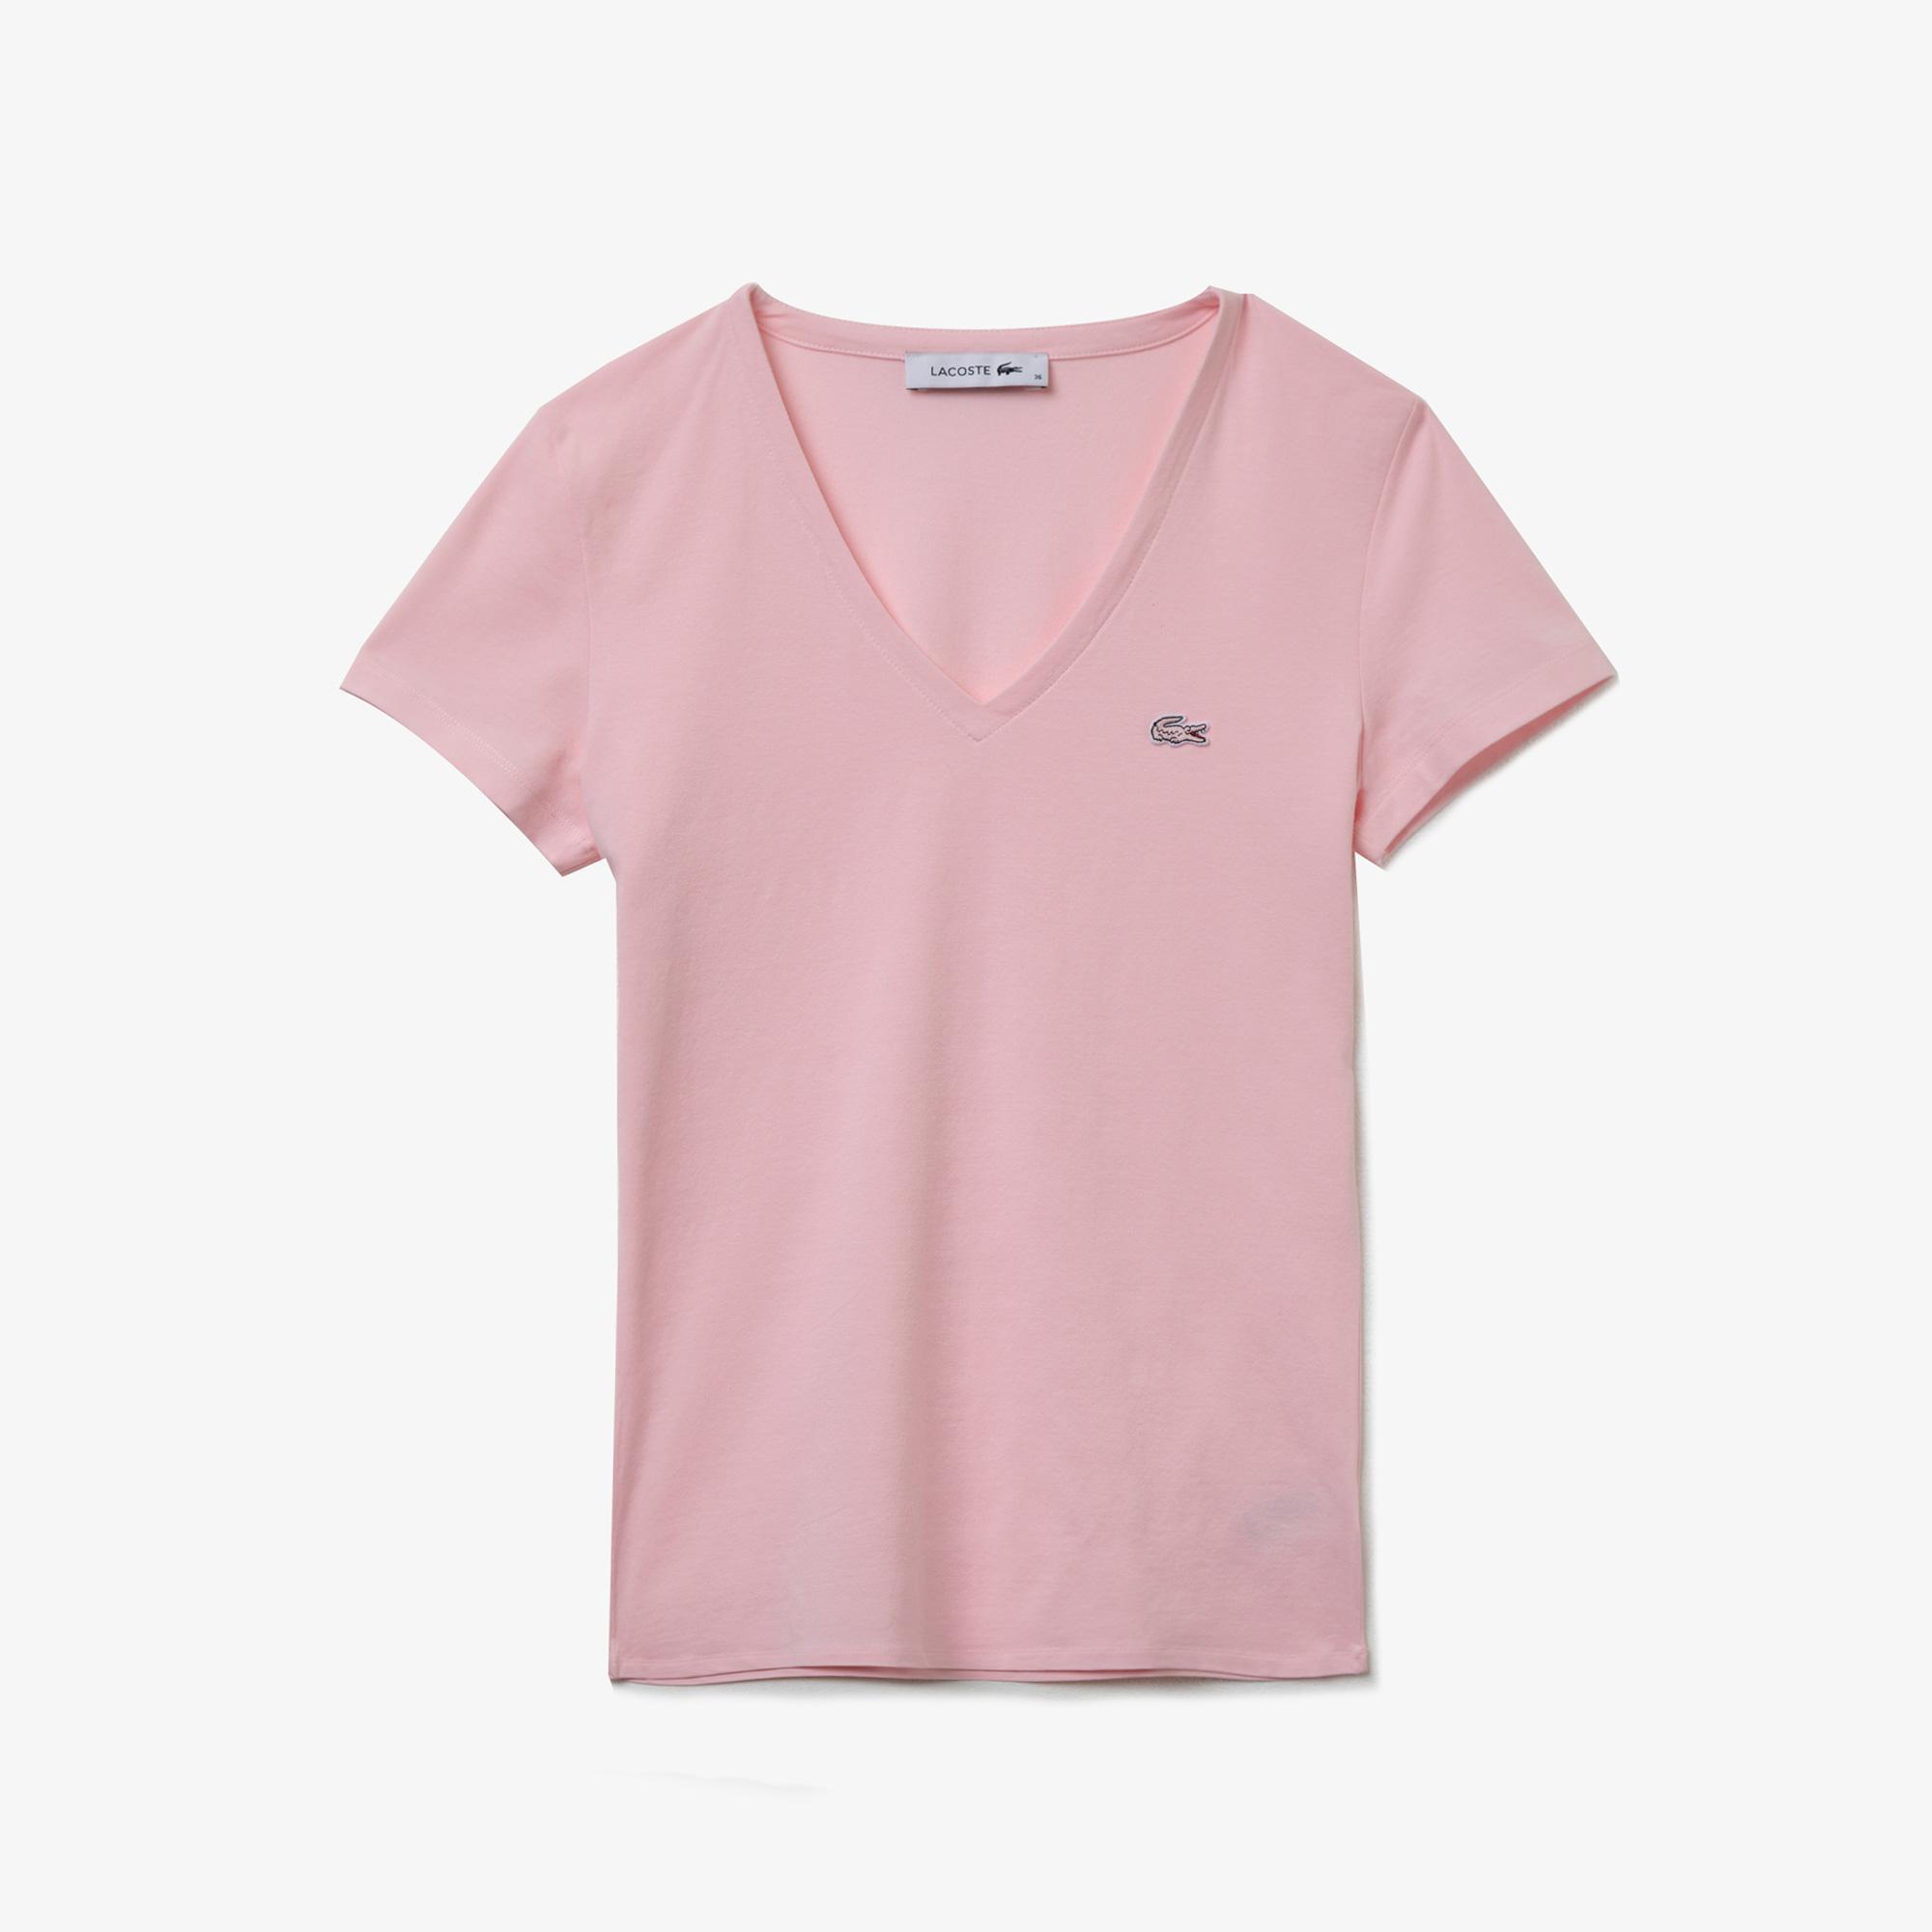 Lacoste Kadın V Yaka Açık Pembe T-Shirt